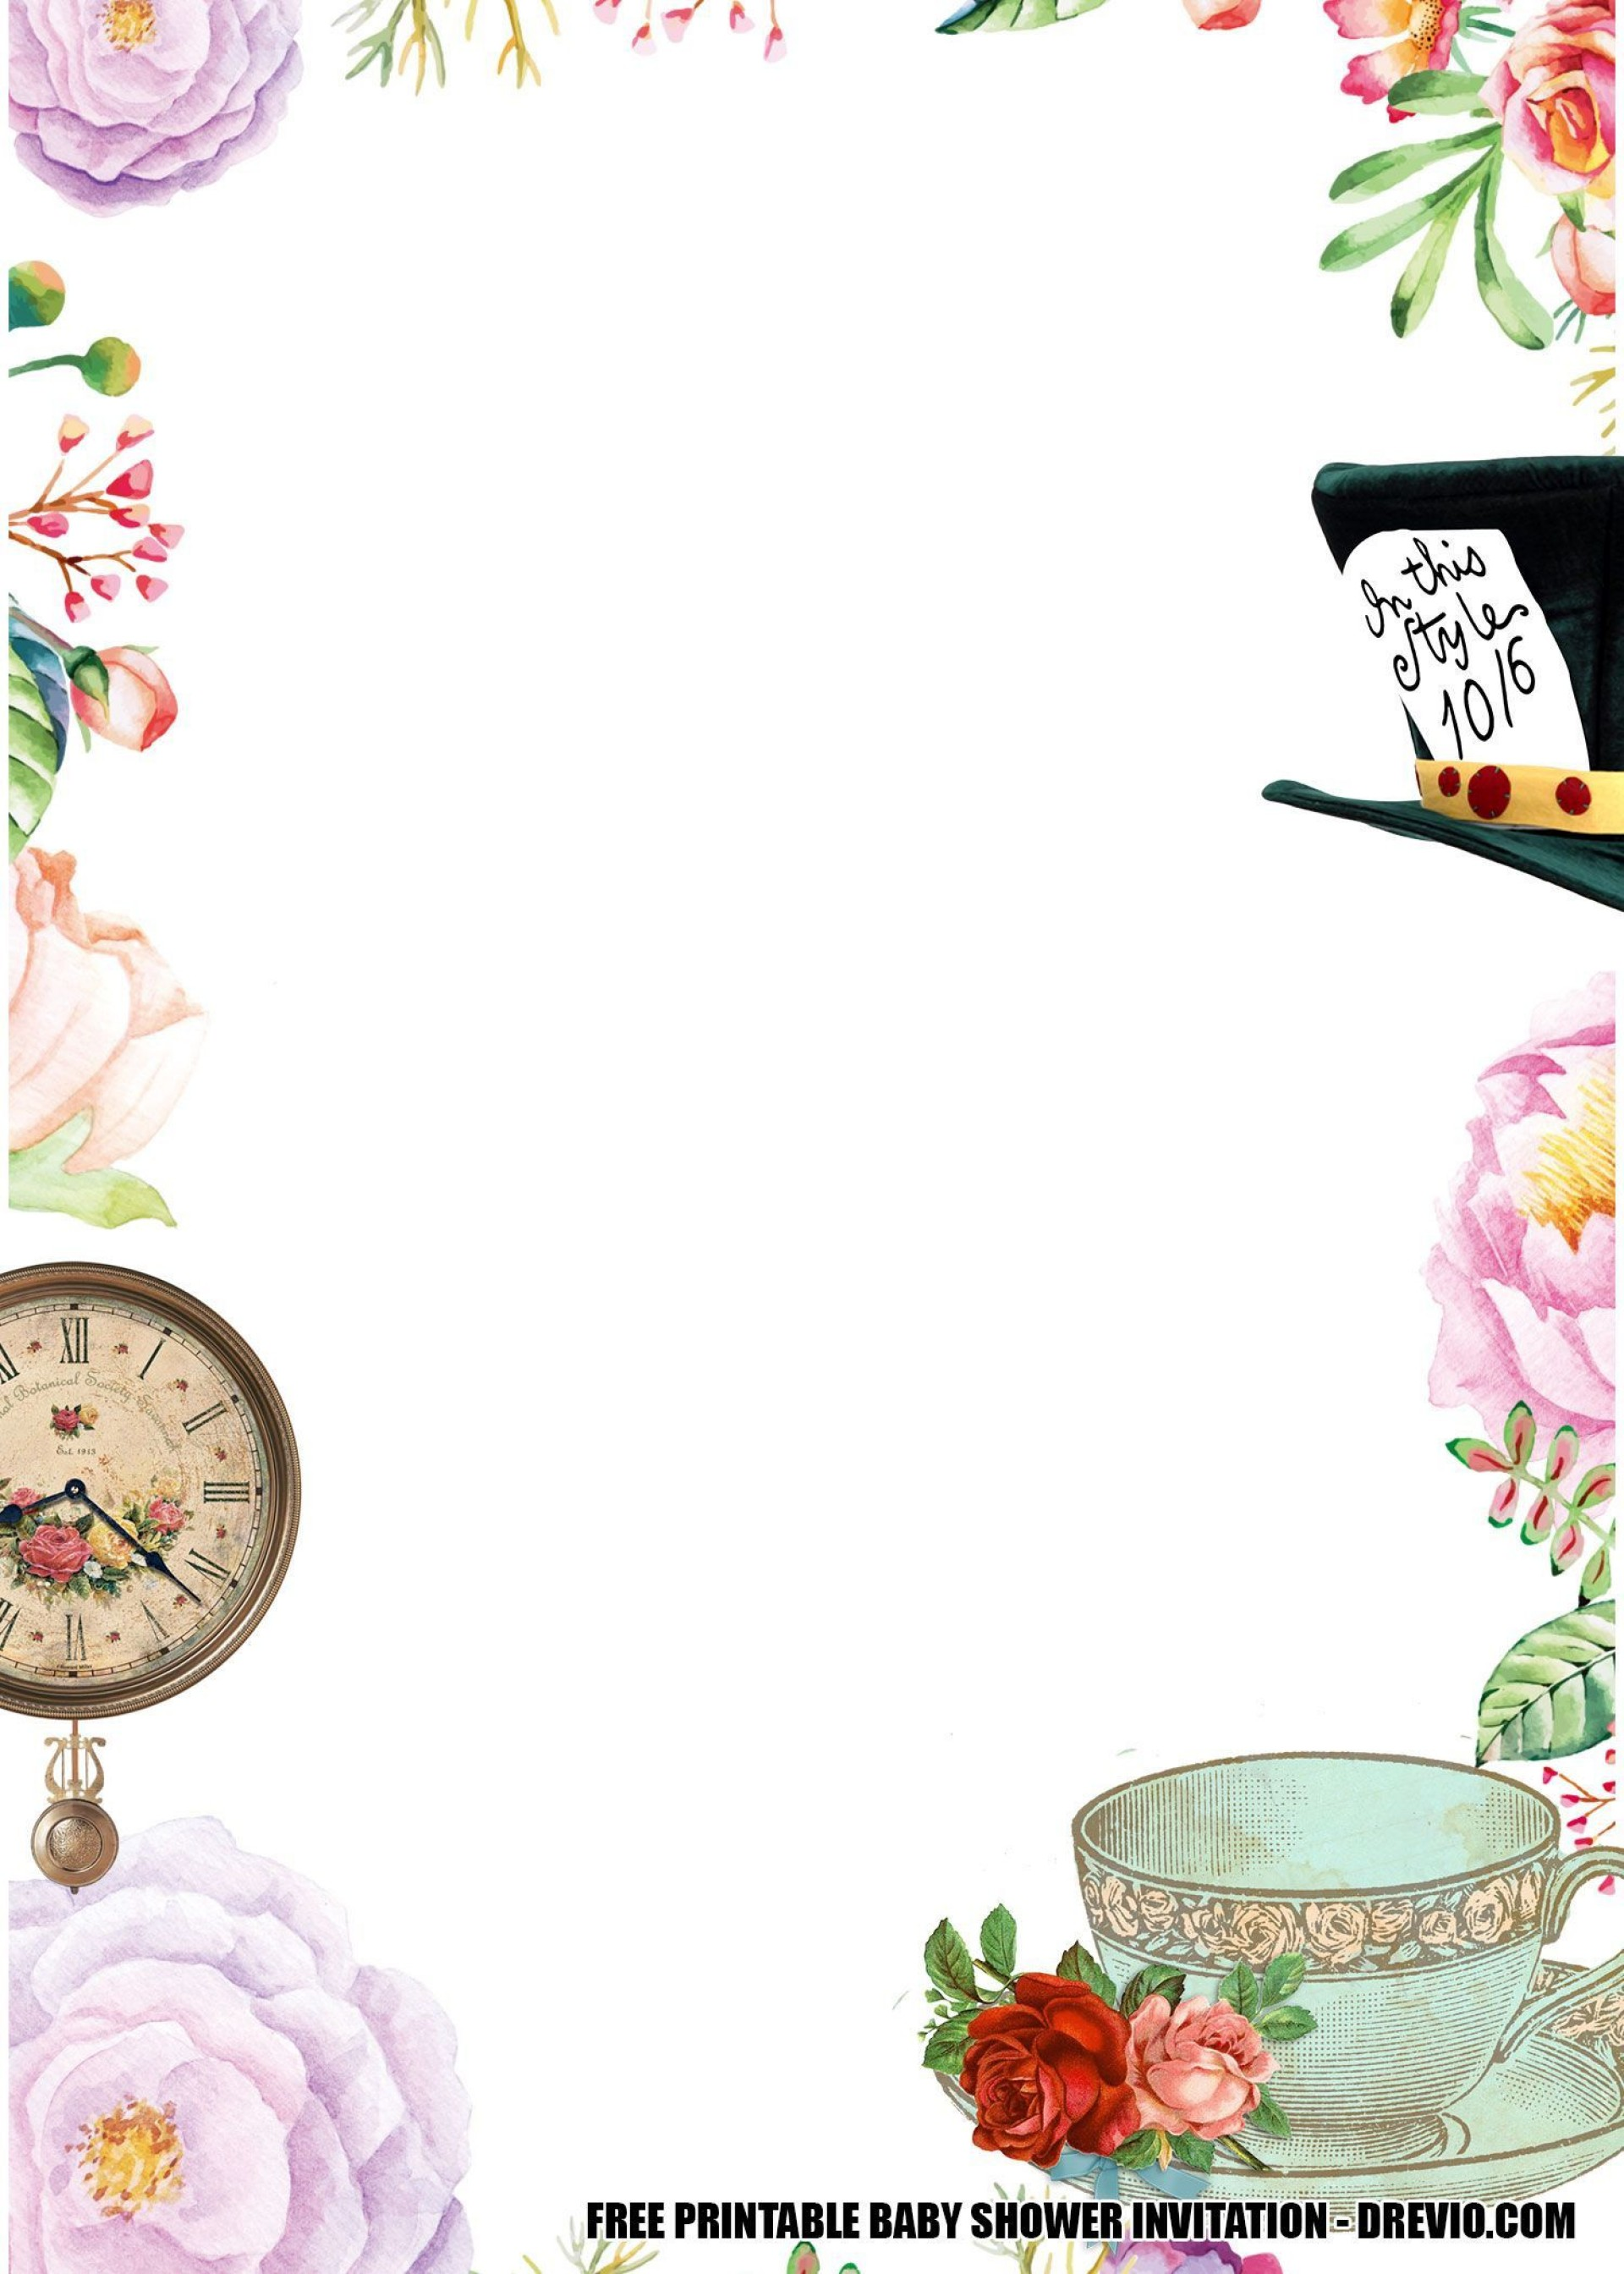 001 Impressive Alice In Wonderland Tea Party Template Idea  Templates Invitation Free1920